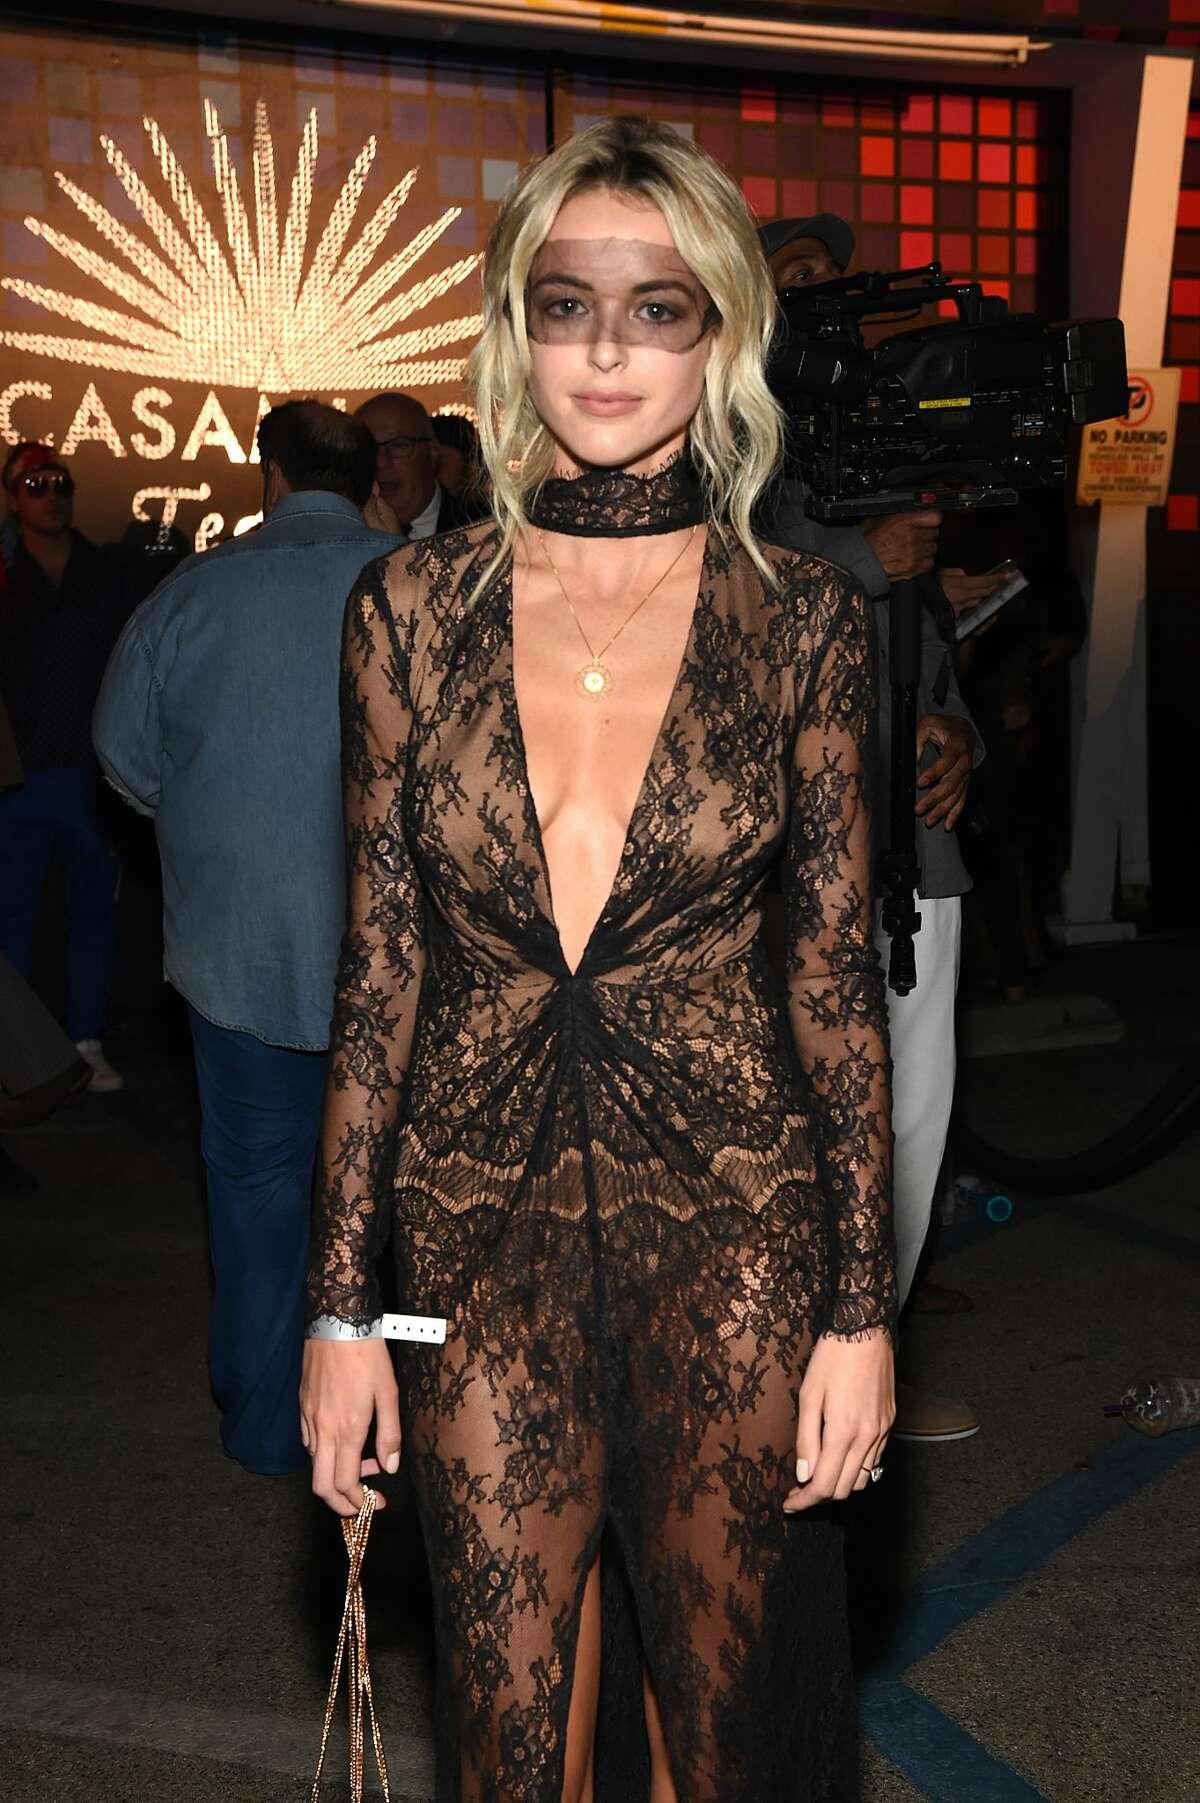 Kaitlynn Carter attends Casamigos Halloween Party on October 27, 2017 in Los Angeles, California.